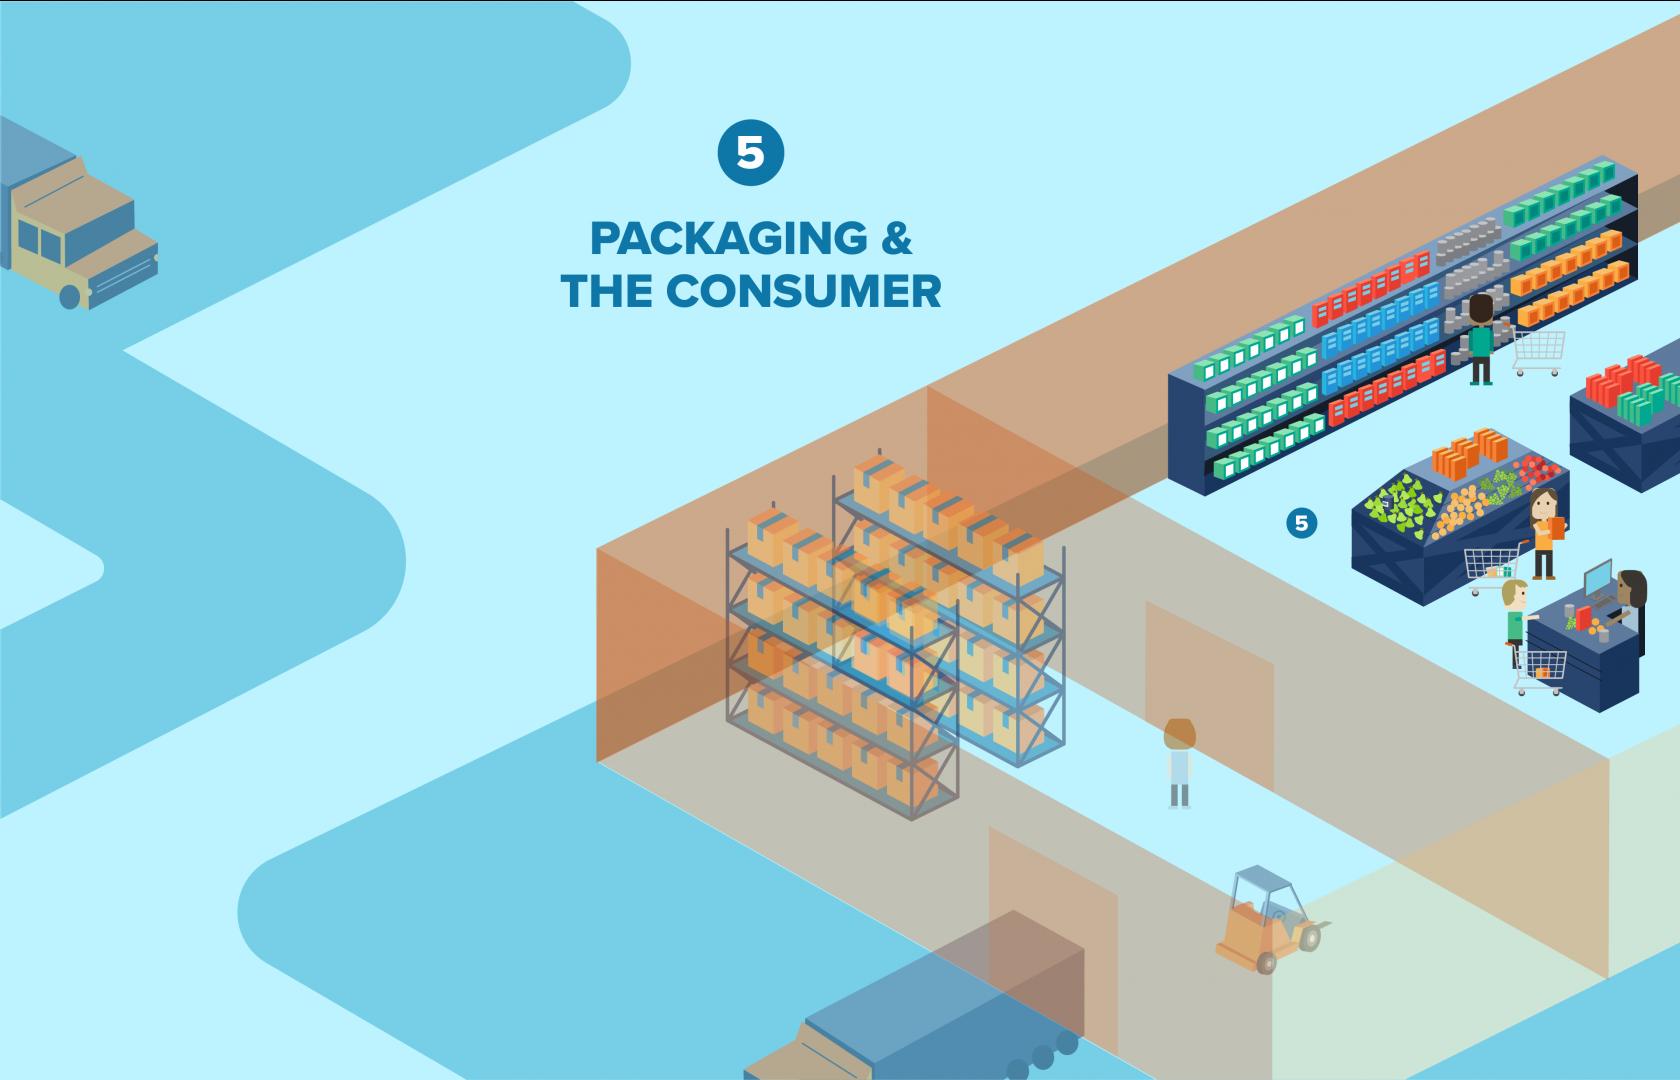 Consumer demand drives food packaging